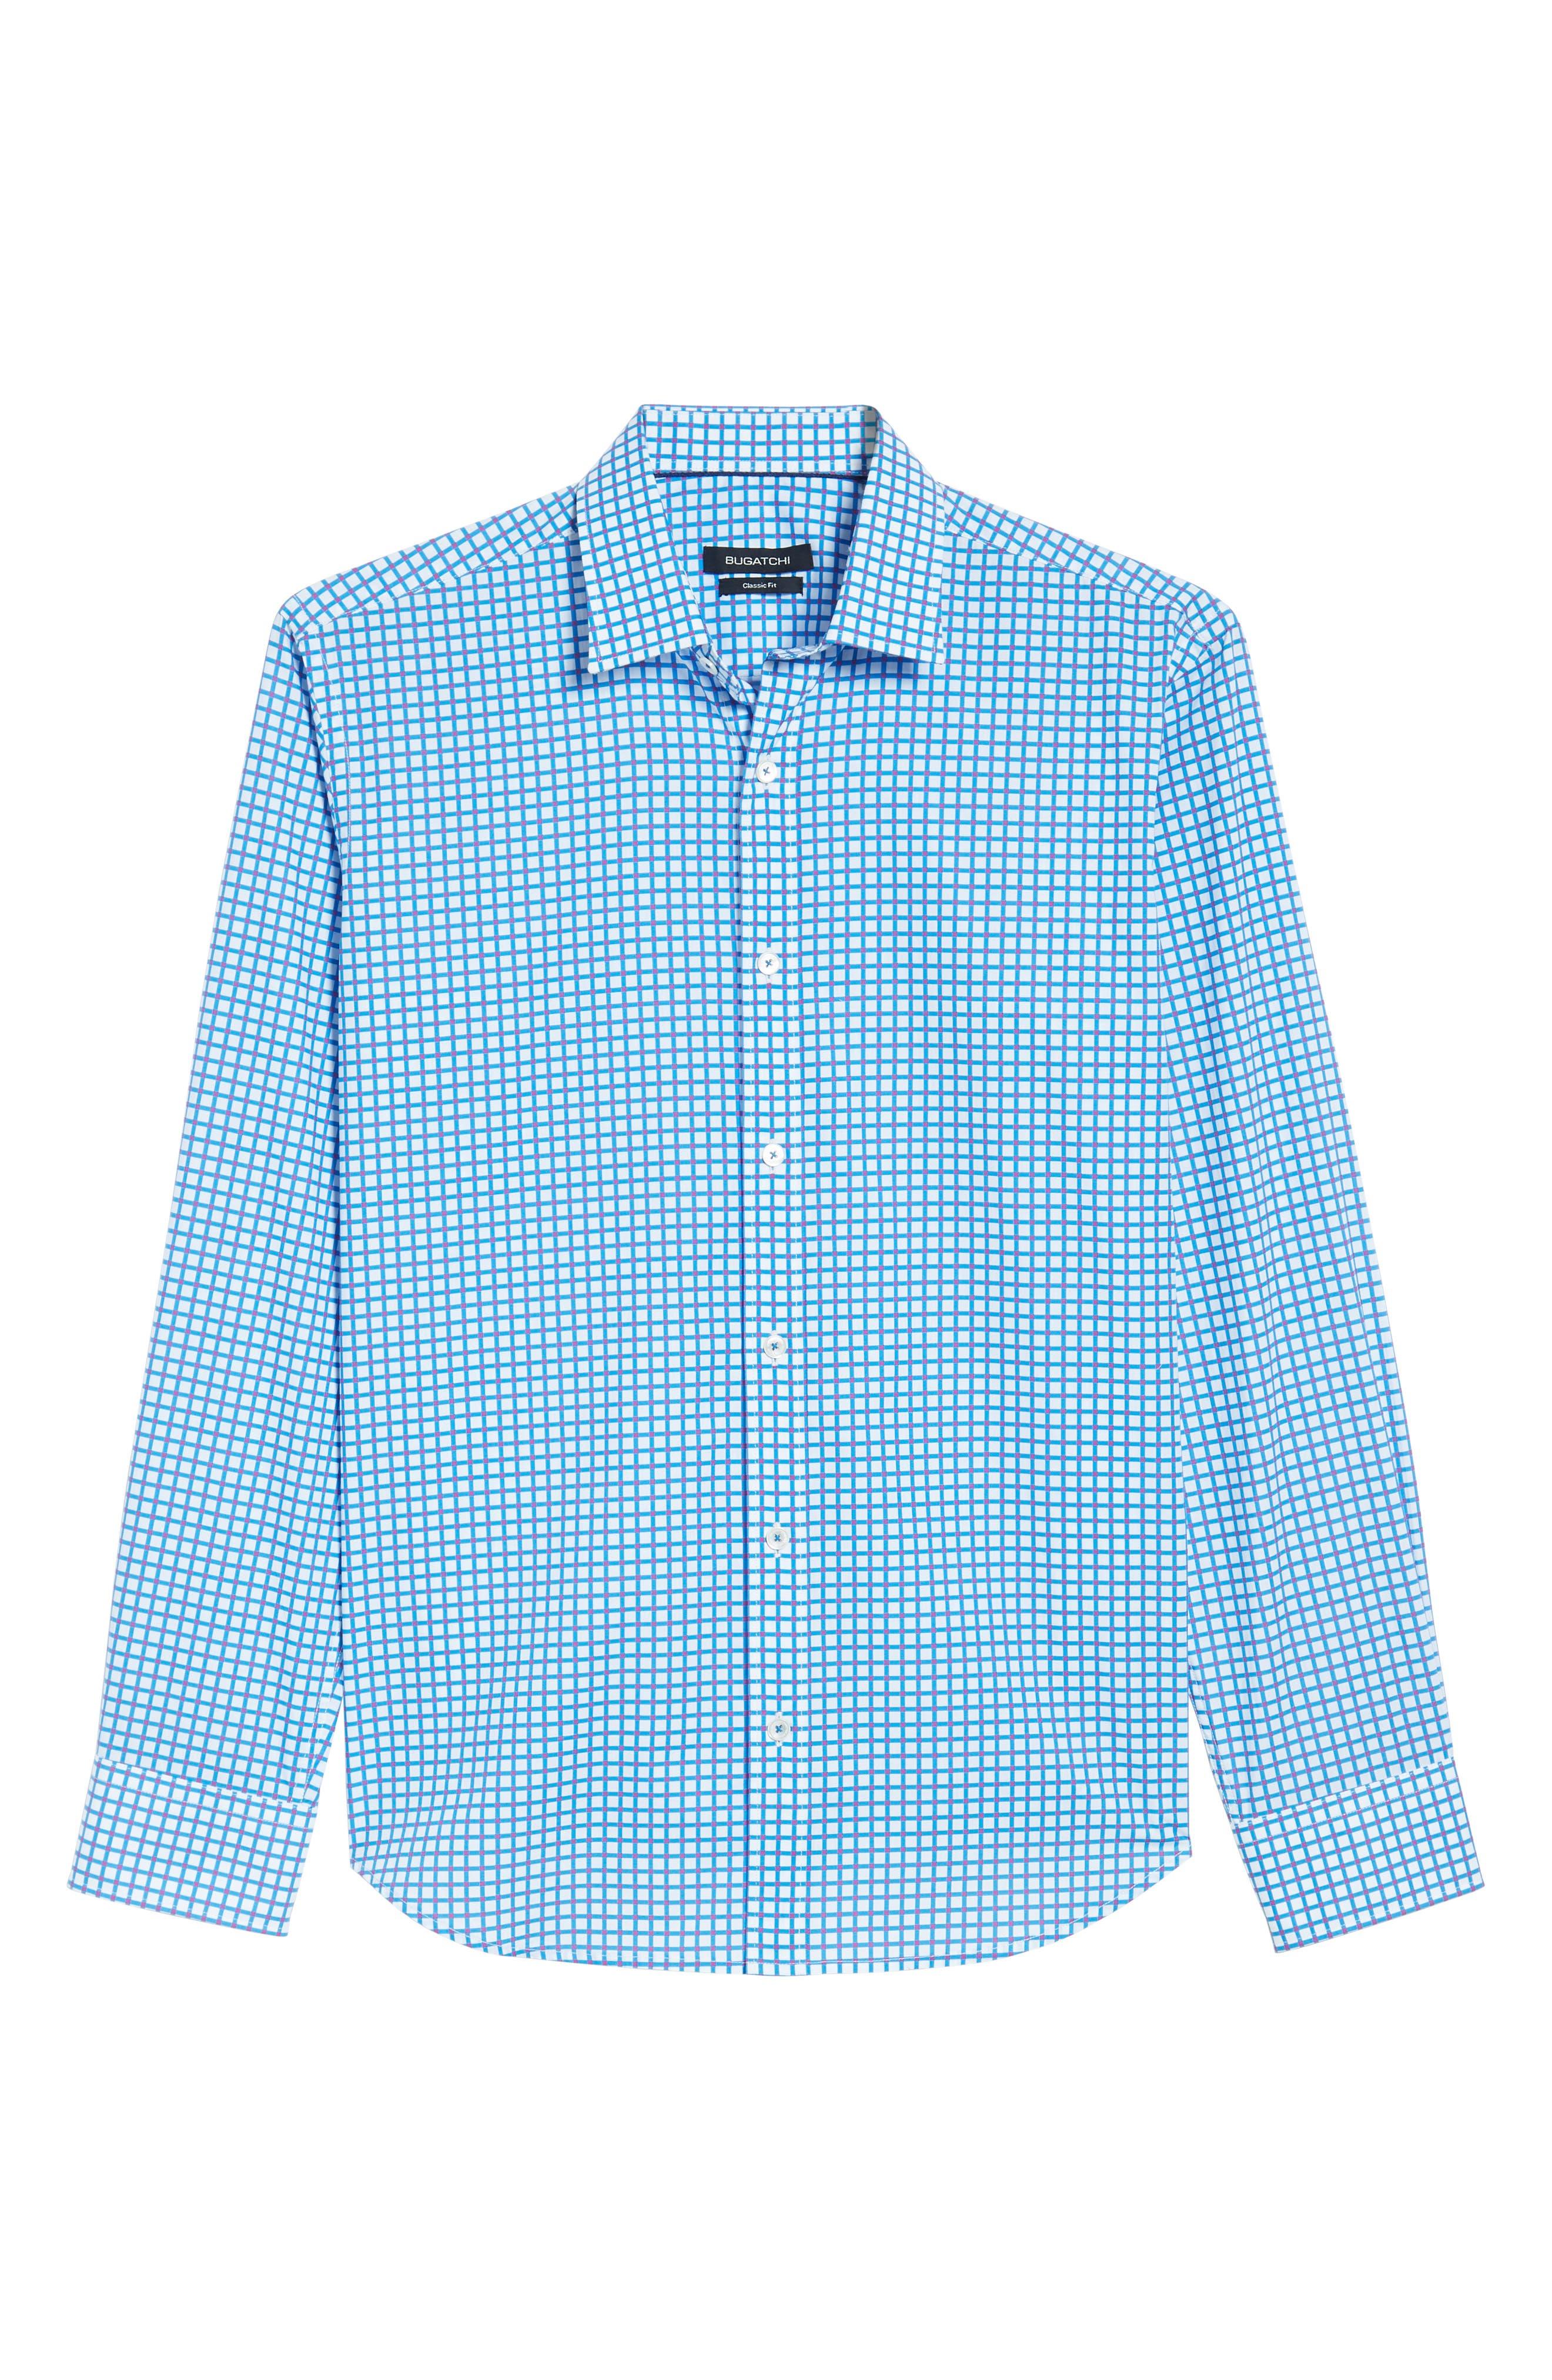 Classic Fit Dot Check Sport Shirt,                             Alternate thumbnail 6, color,                             TURQUOISE